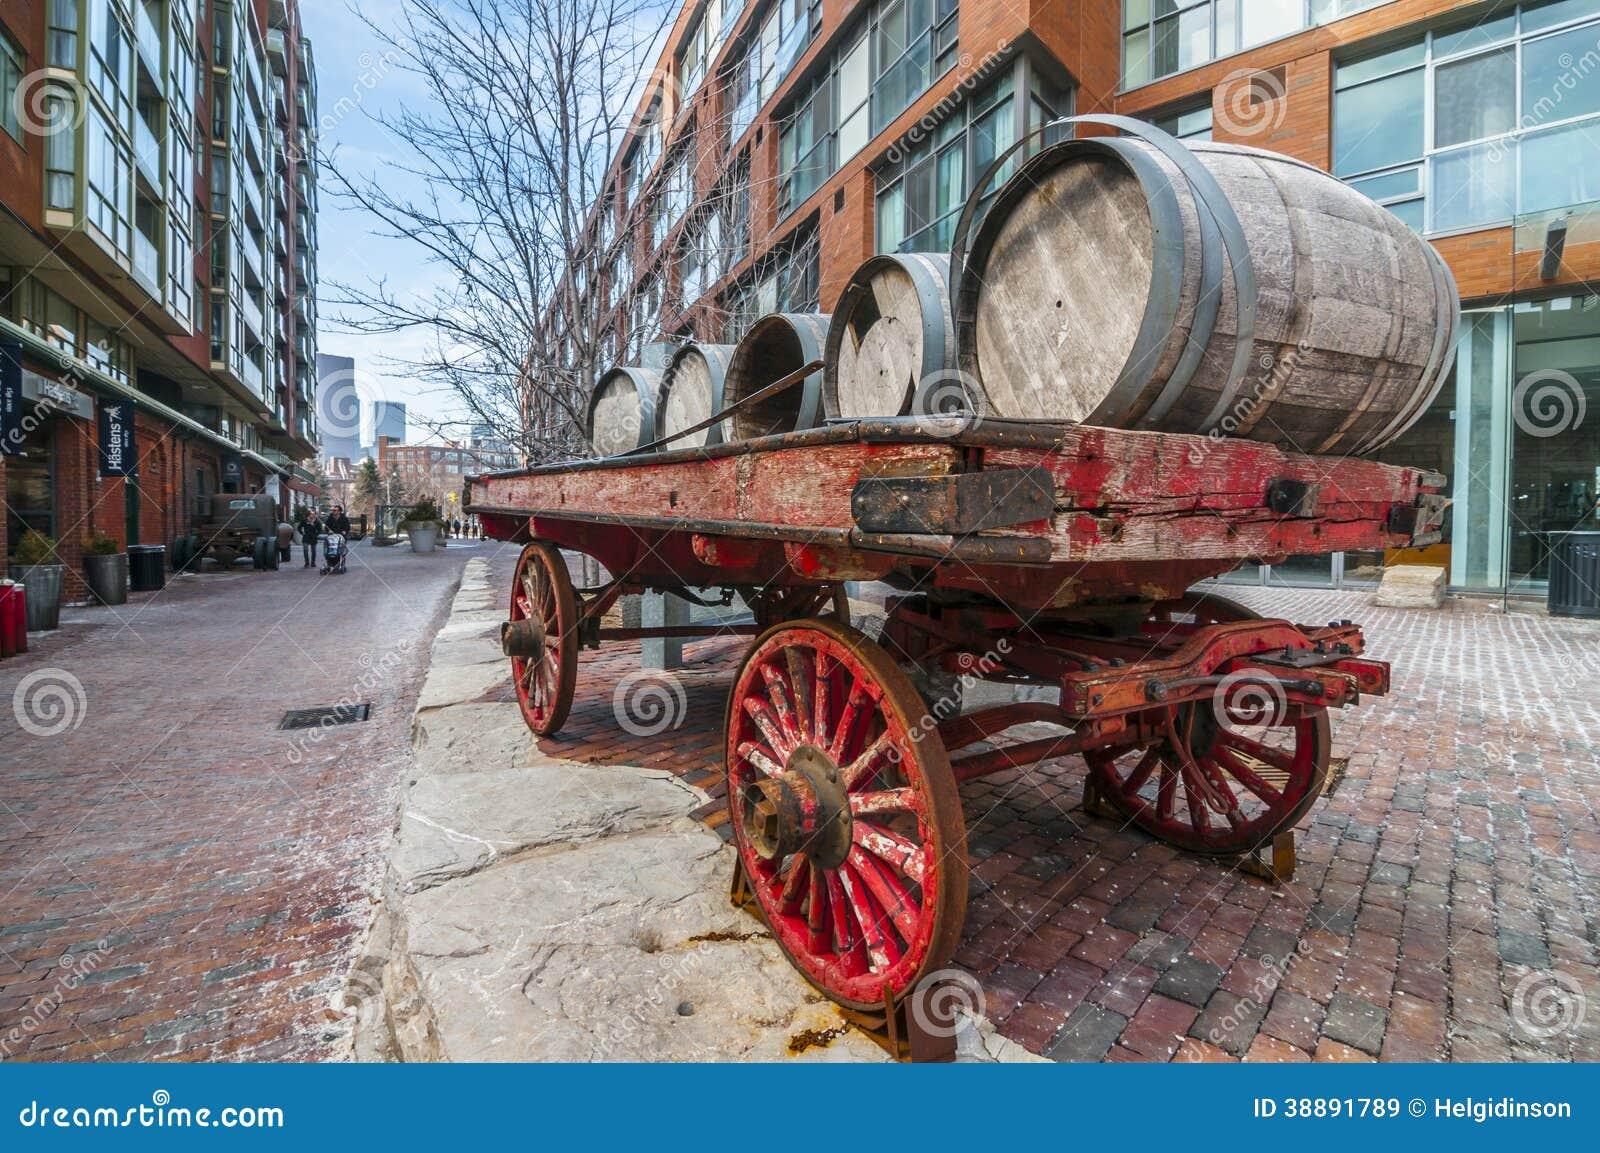 Cart of barrel:Distillery dist. Toronto Canada